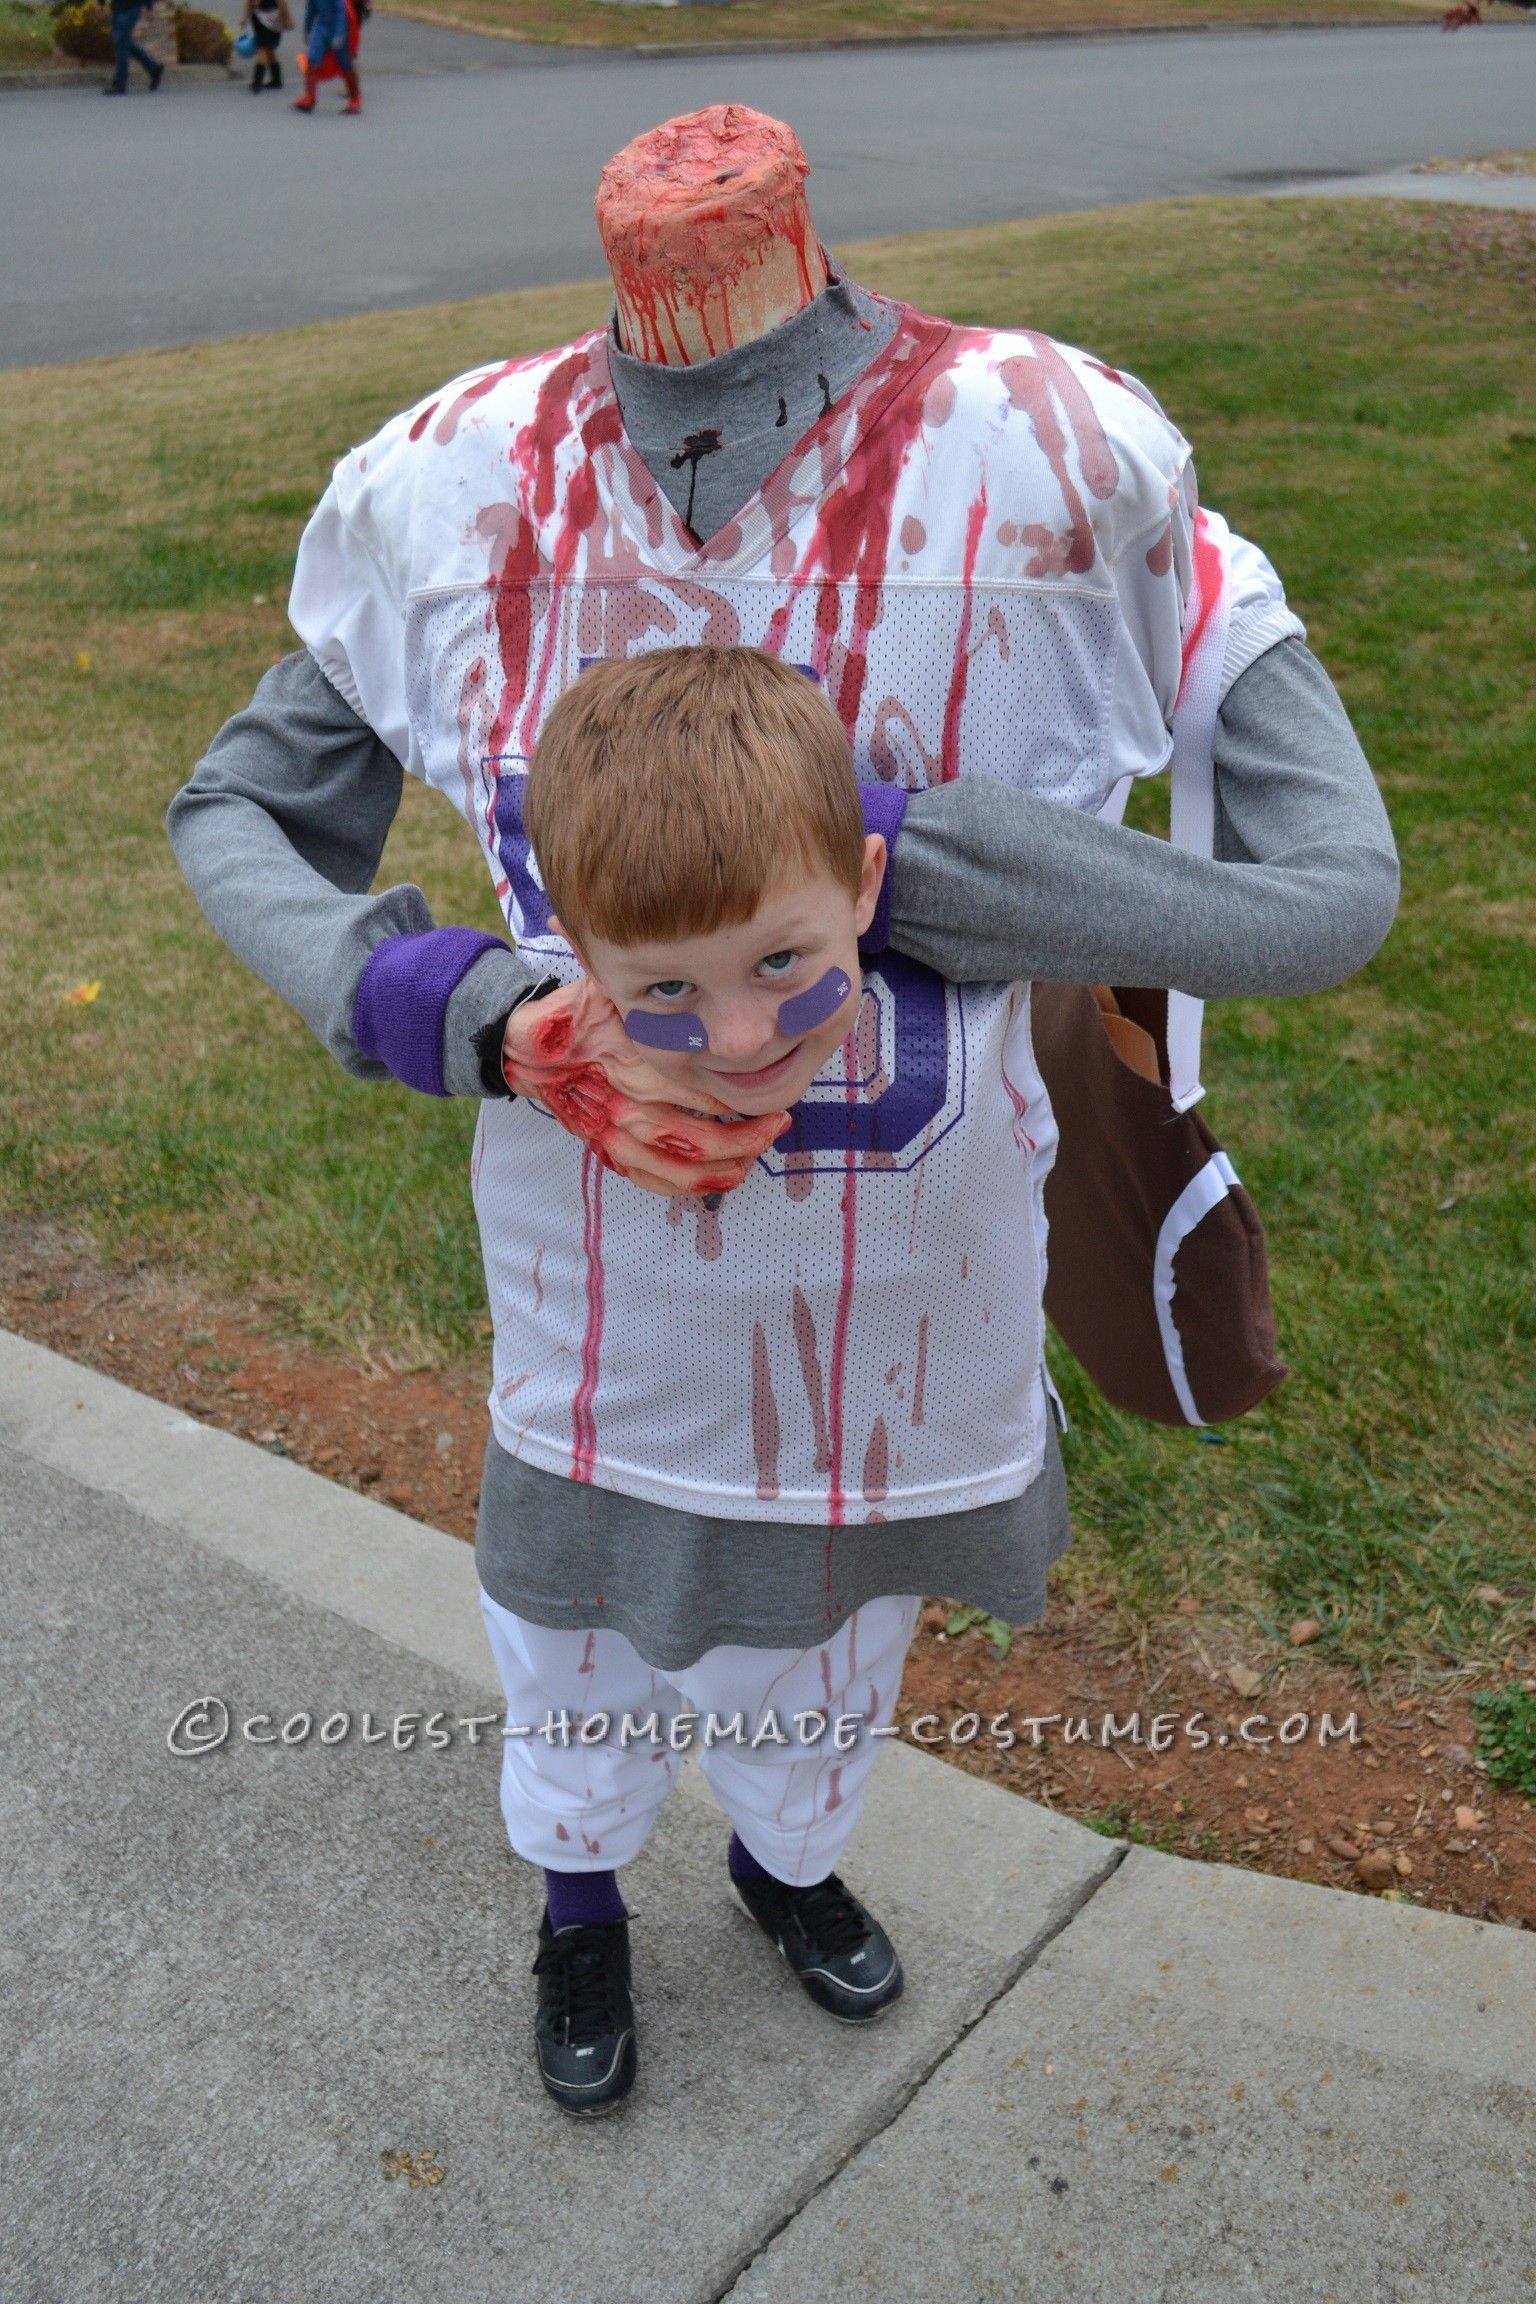 Scary DIY Headless Football Player Halloween Costume | Football ...